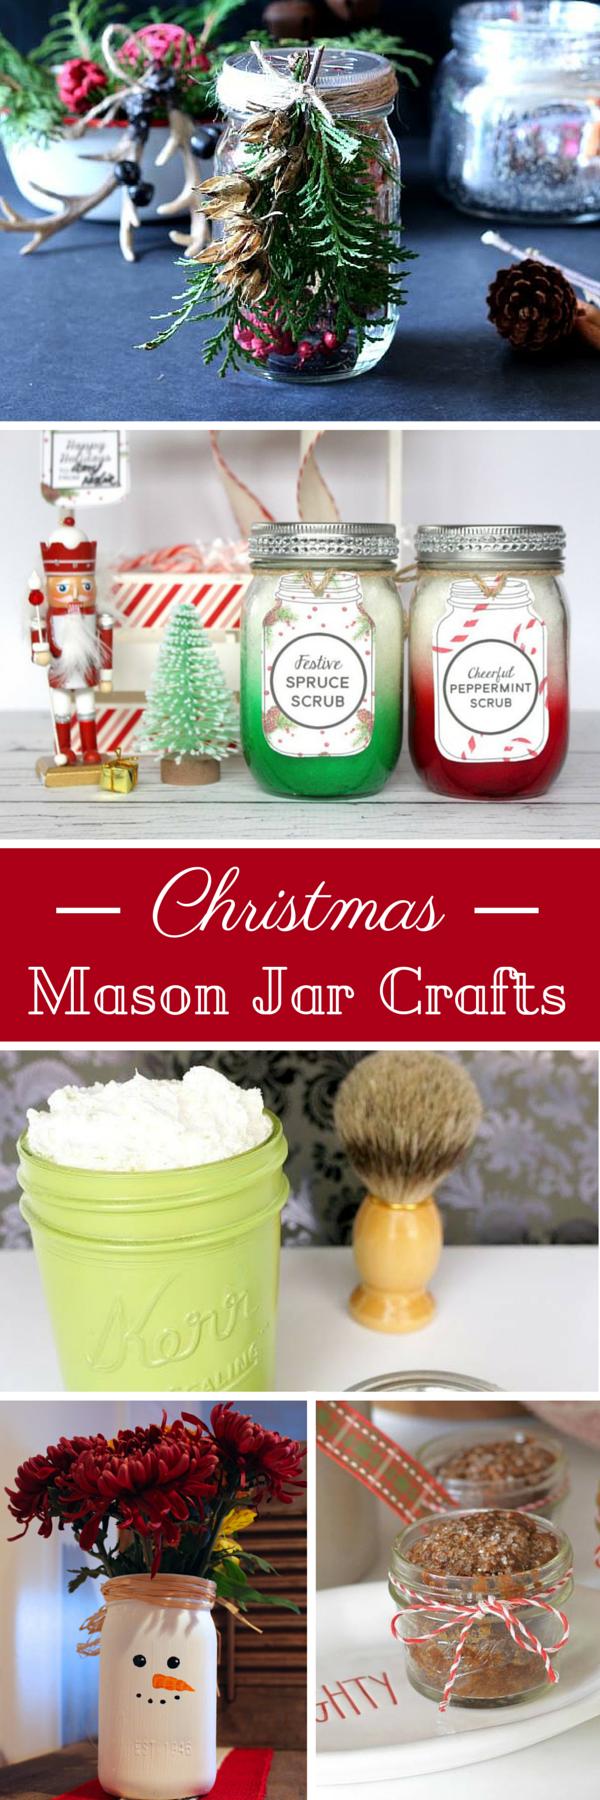 DIY Christmas Mason Jar Crafts